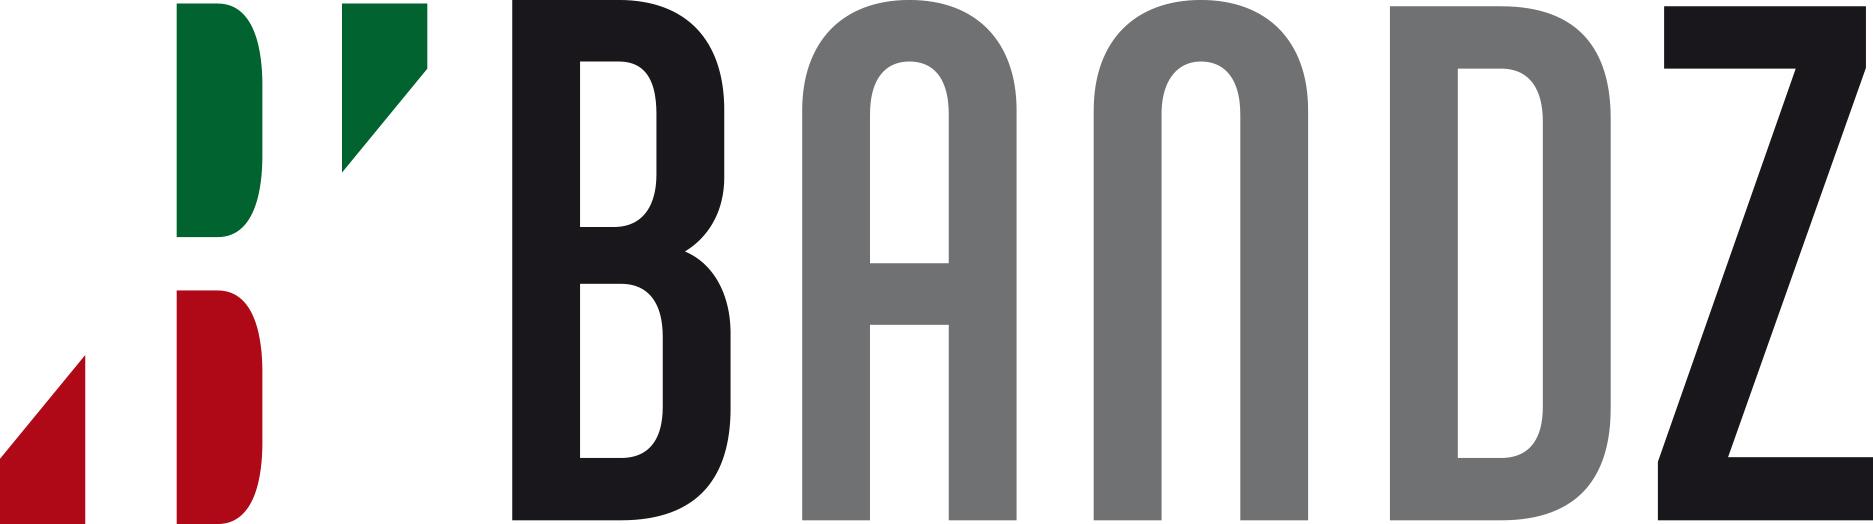 Bandz - Aromi